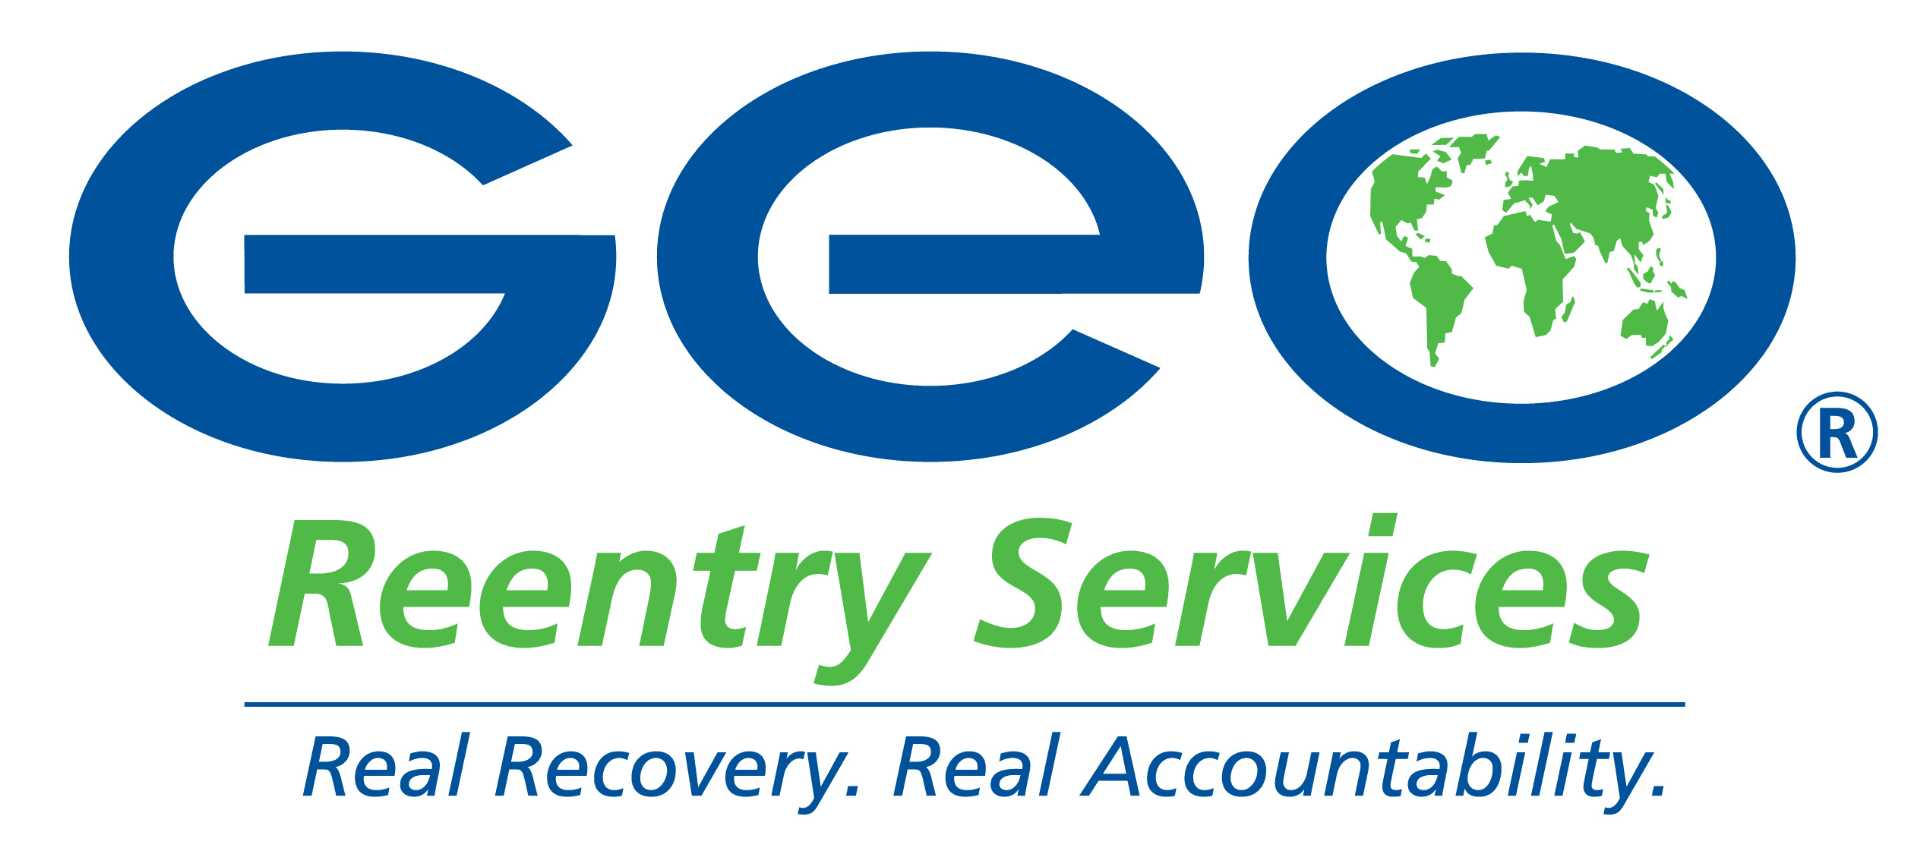 GEO's York Reentry Service Center